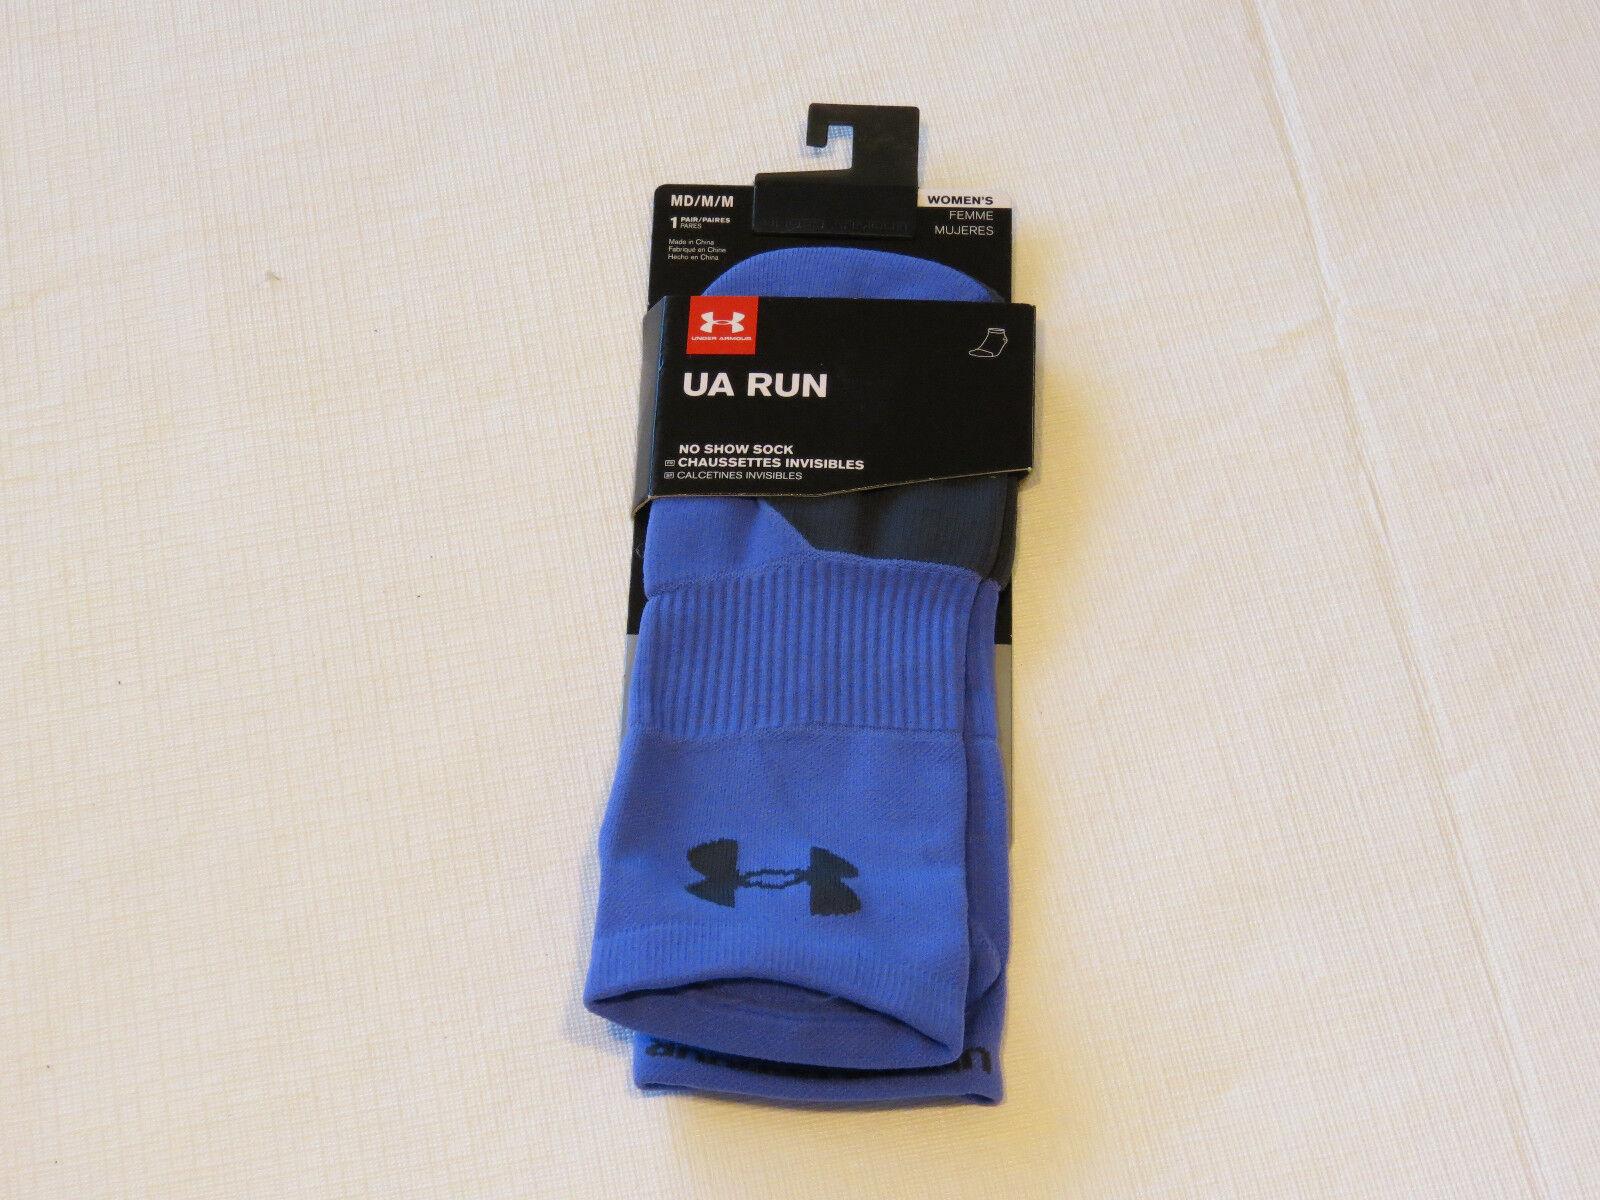 Under Armour UA Run No Show Socks 1 pair M MD 7-10.5 running